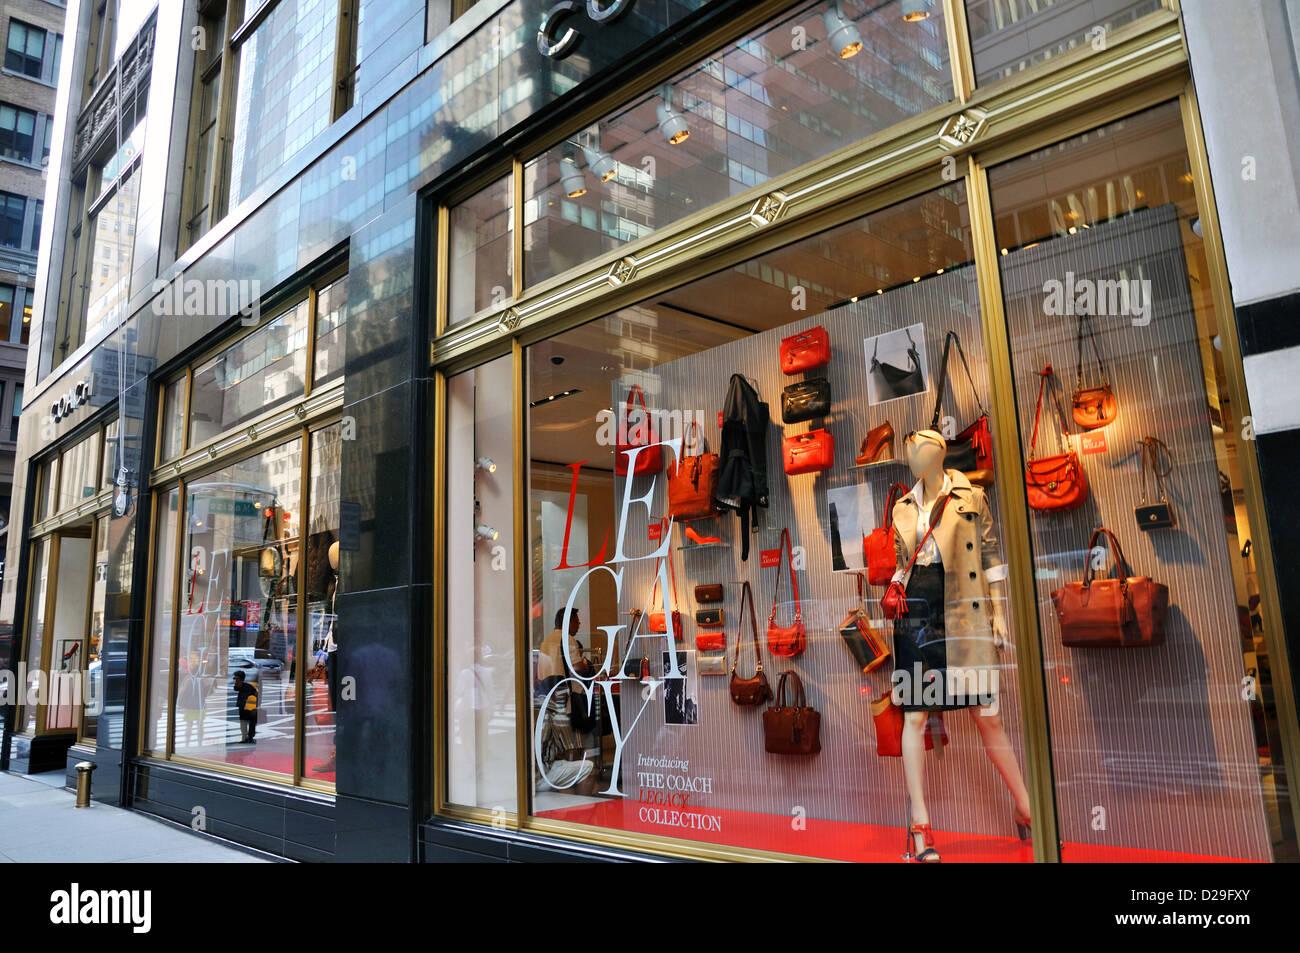 Coach Storefront New York City Usa Stock Photo Royalty Free Image 53070499 Alamy